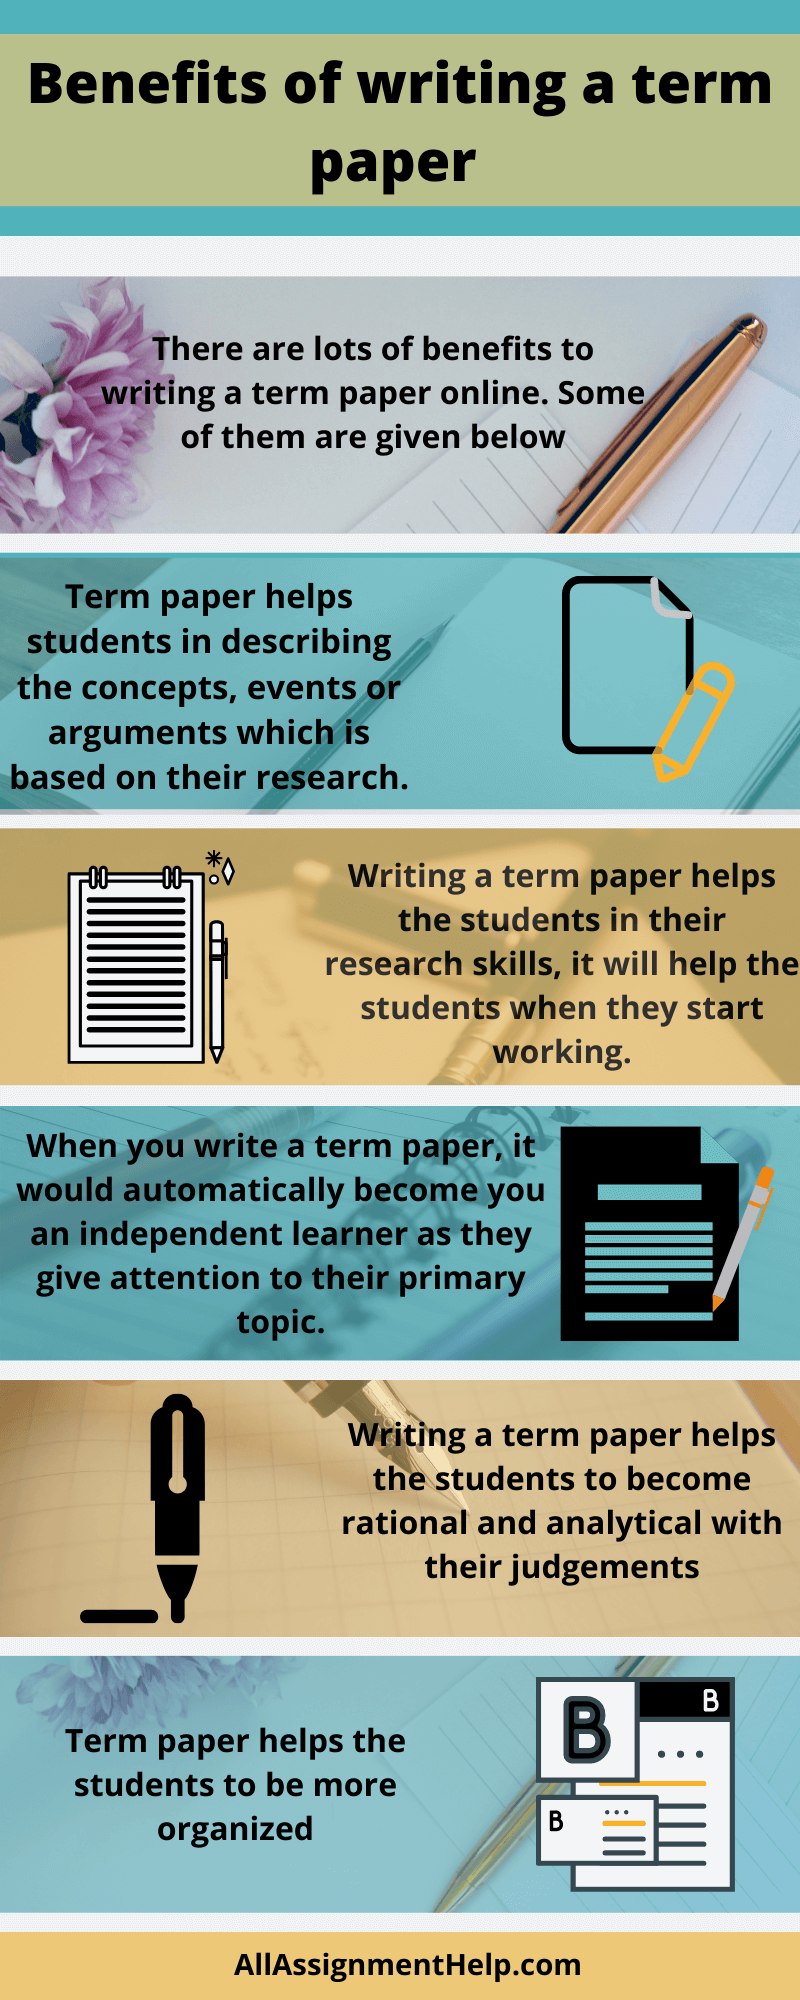 Term-paper